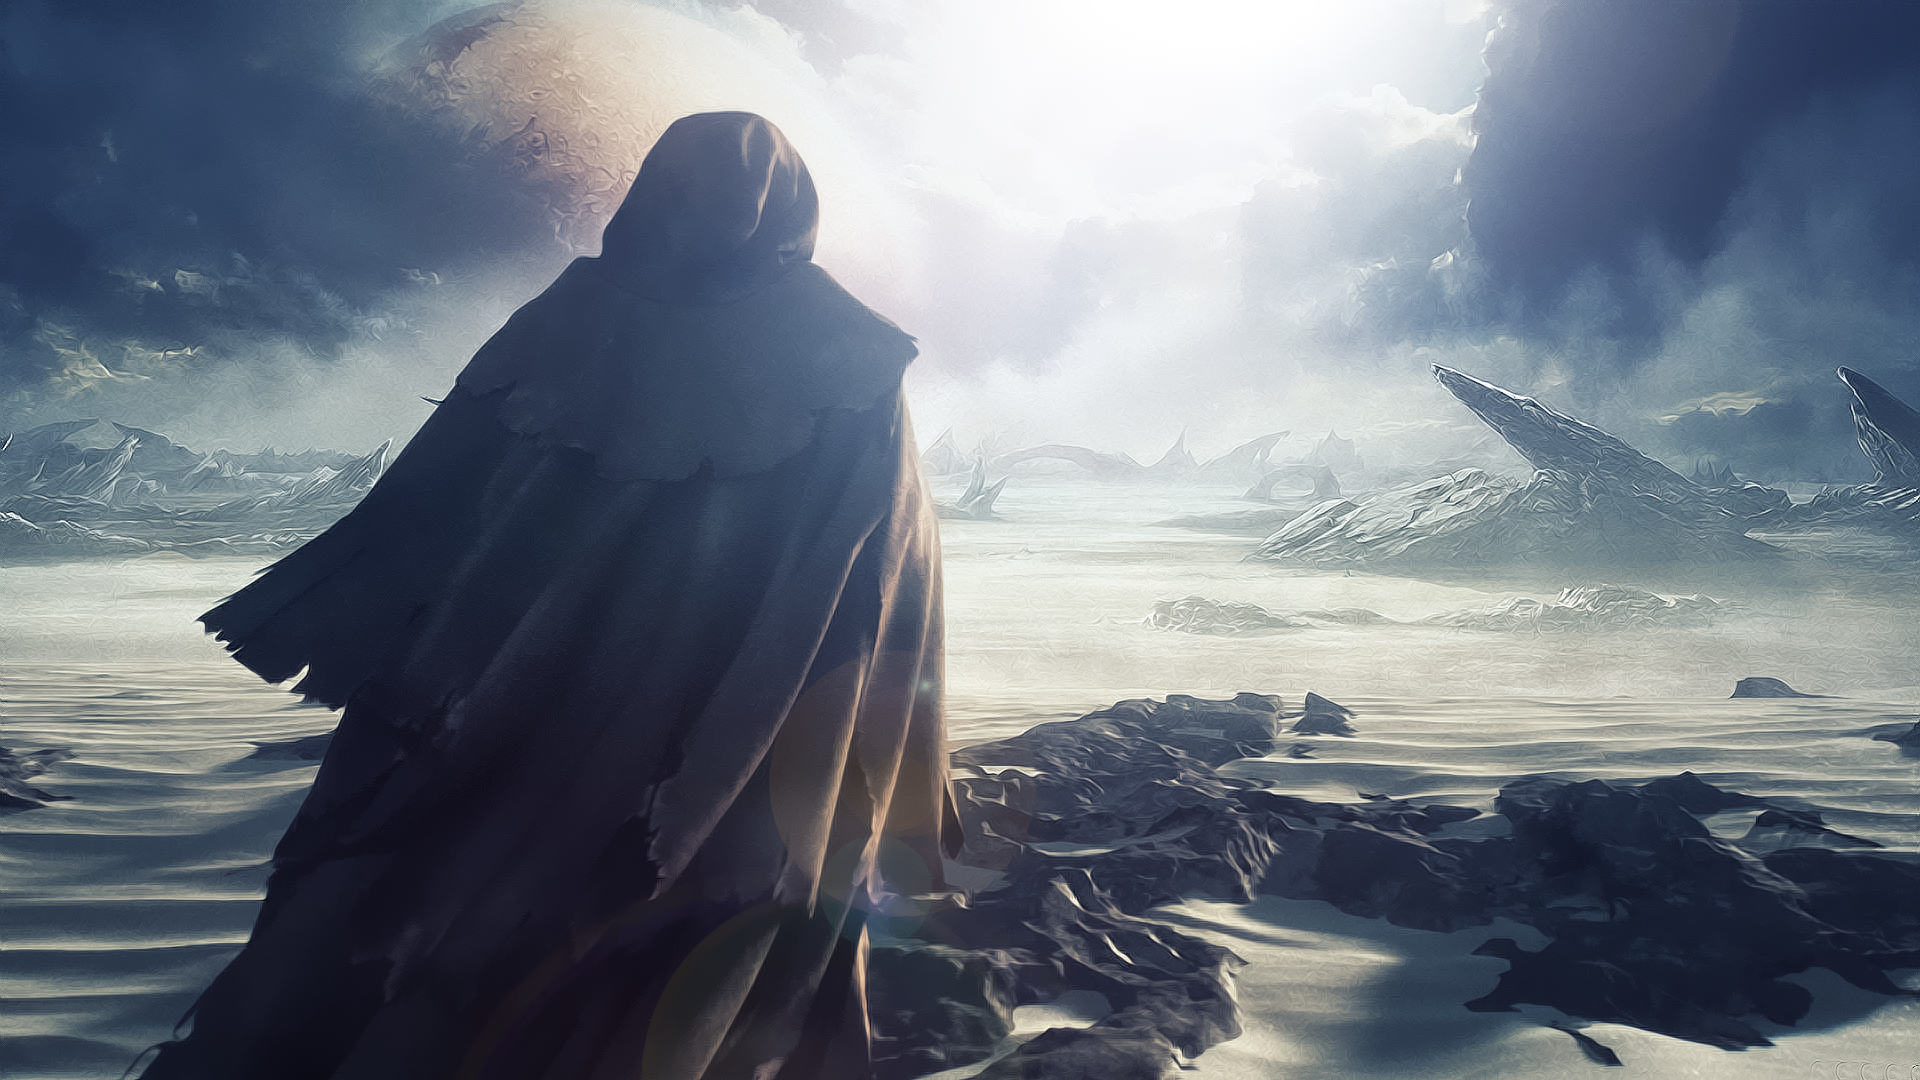 Halo 5 Wallpaper by KingAirsoftSniper